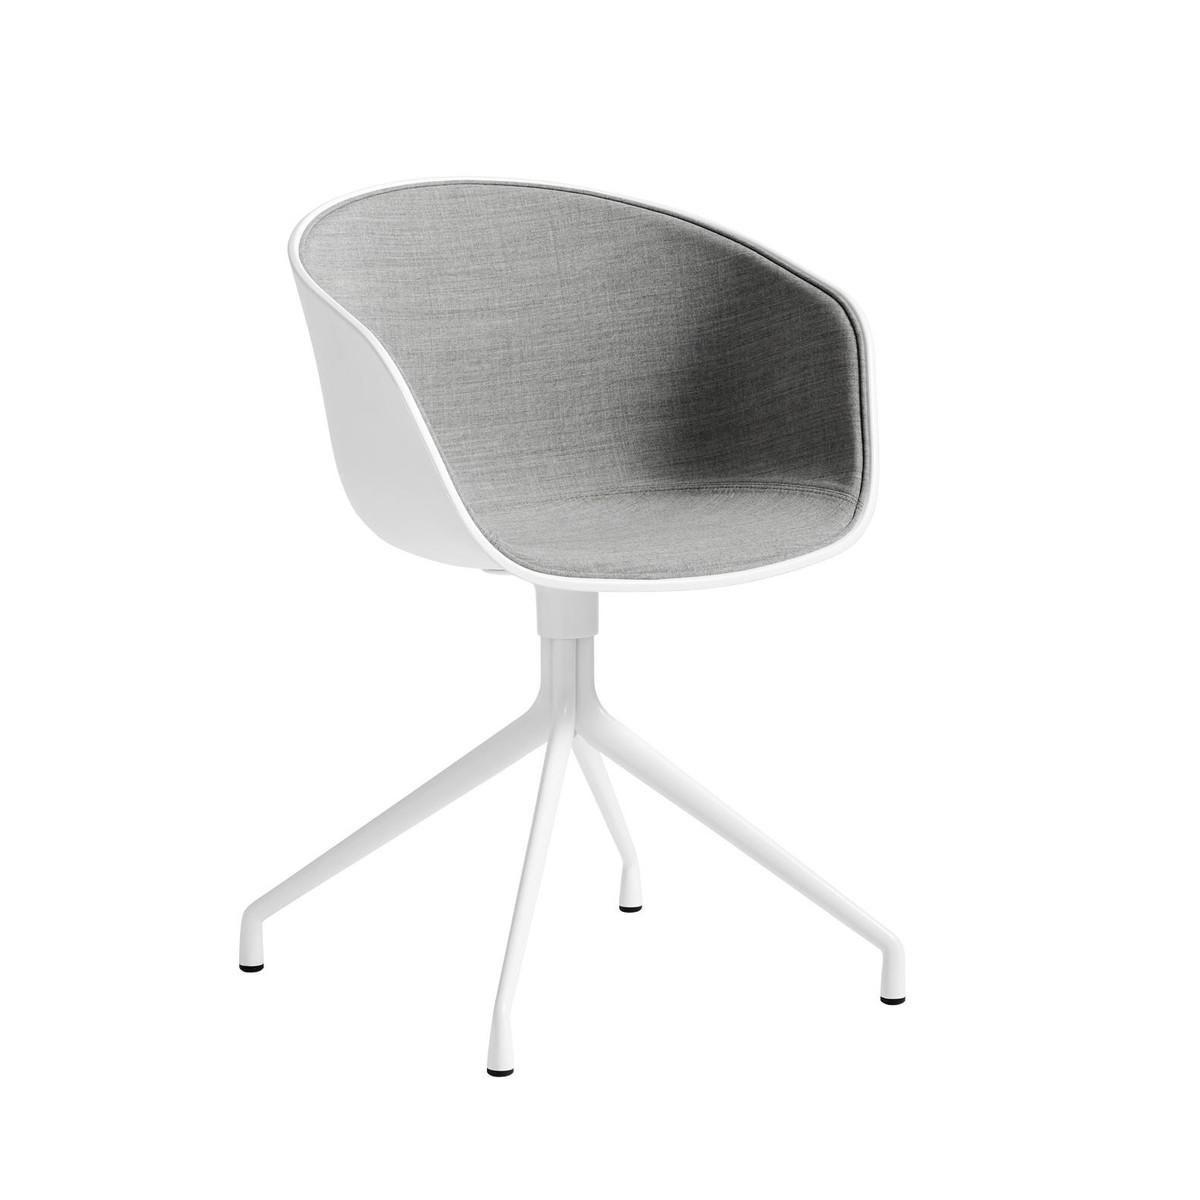 about a chair 20 drehstuhl gepolstert wei hay drehst hle sitzm bel m bel. Black Bedroom Furniture Sets. Home Design Ideas